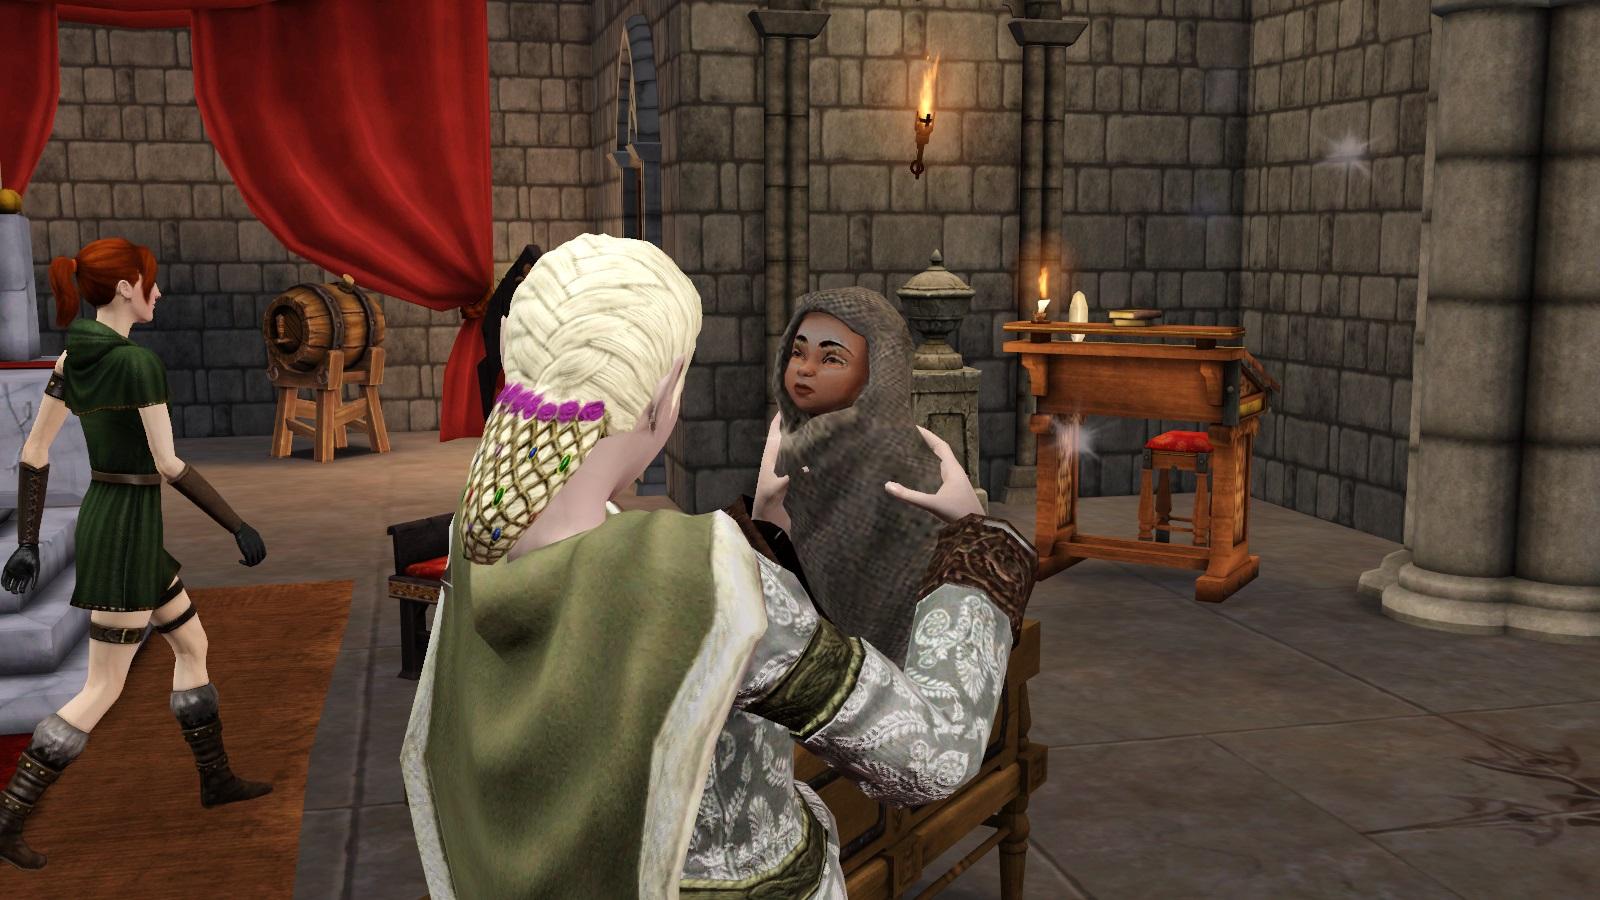 Medieval 3dxxxvid pics erotica scene